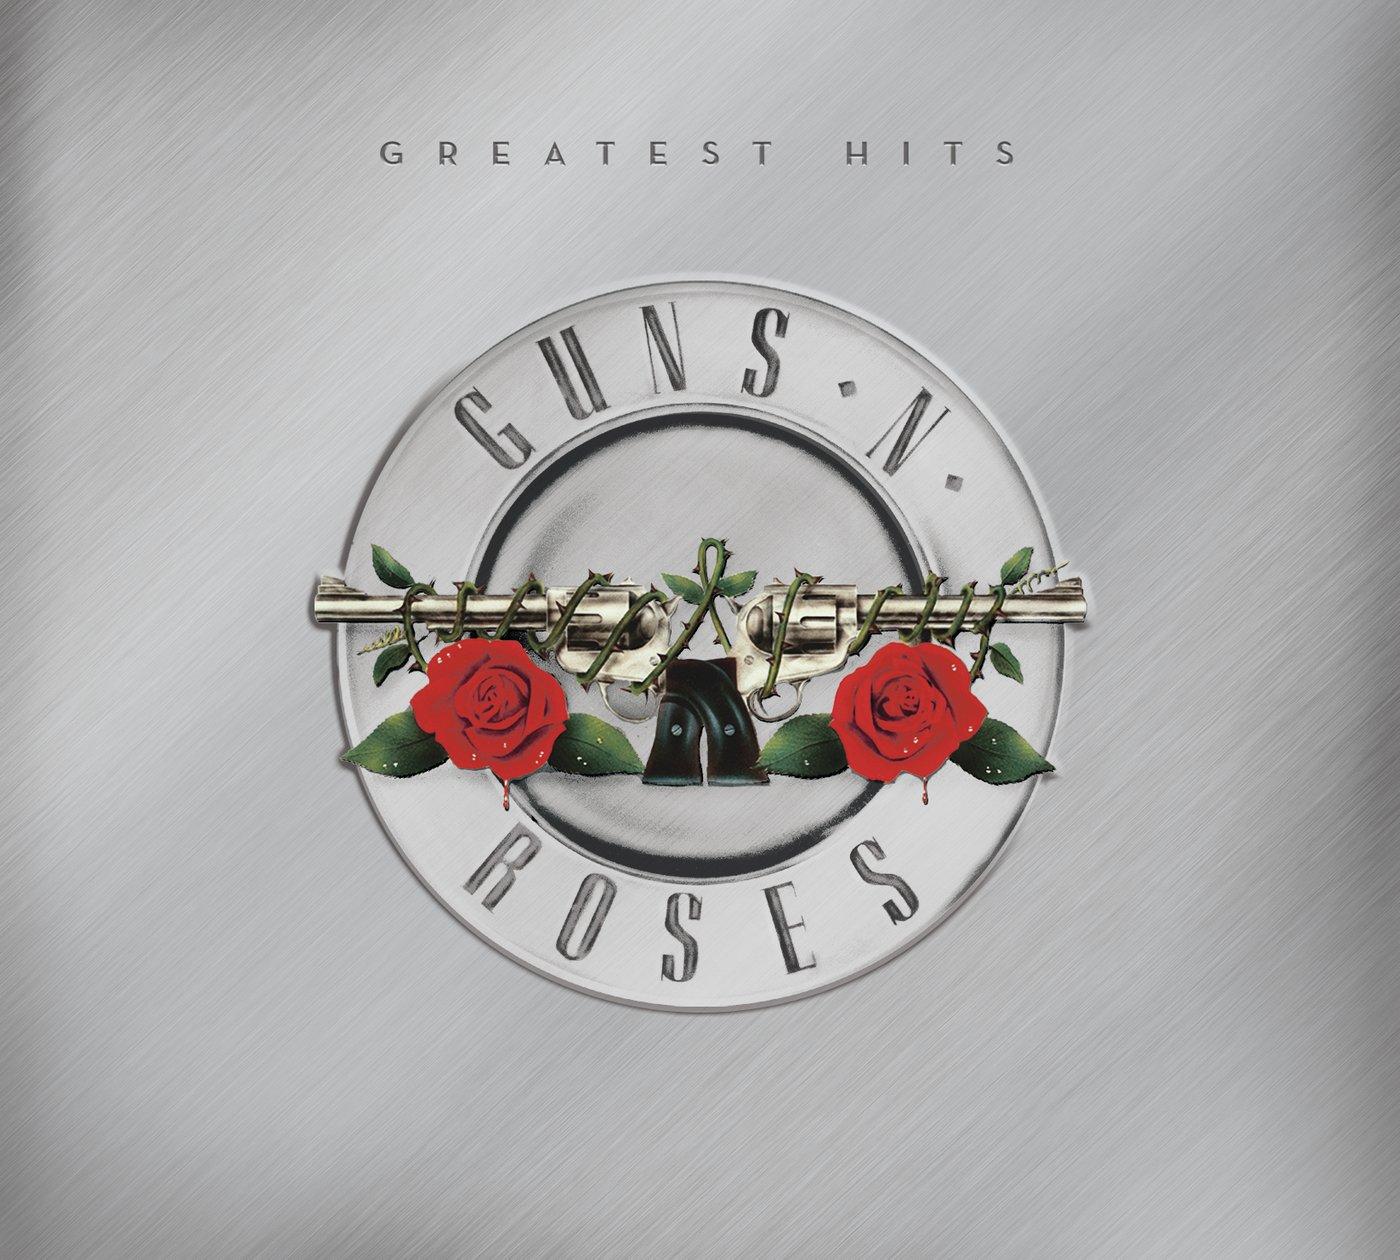 Guns N' Roses - Greatest Hits (Import, EU)